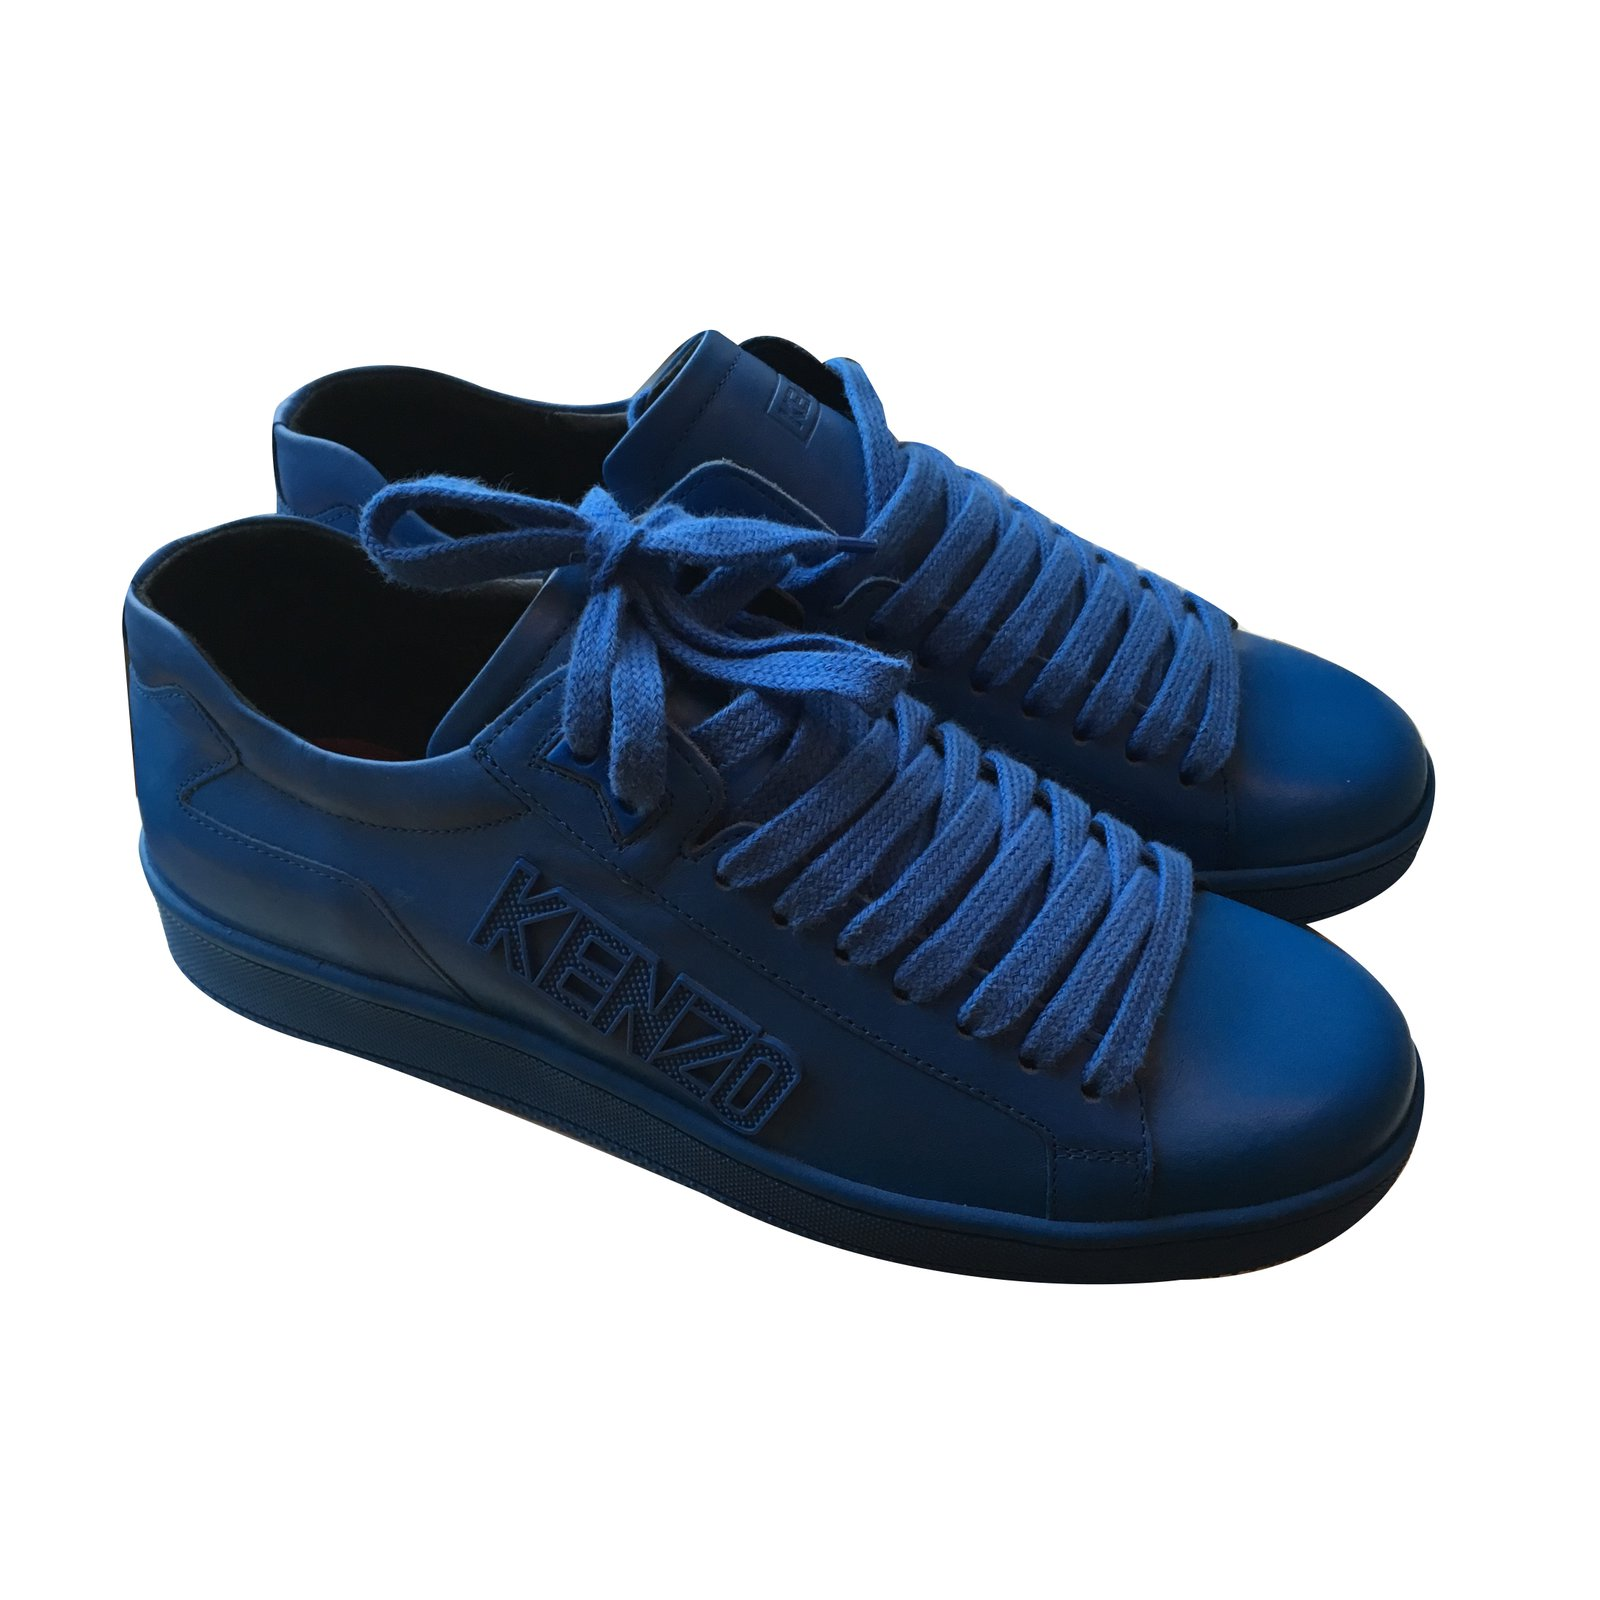 Kenzo Sneakers Sneakers Leather Blue